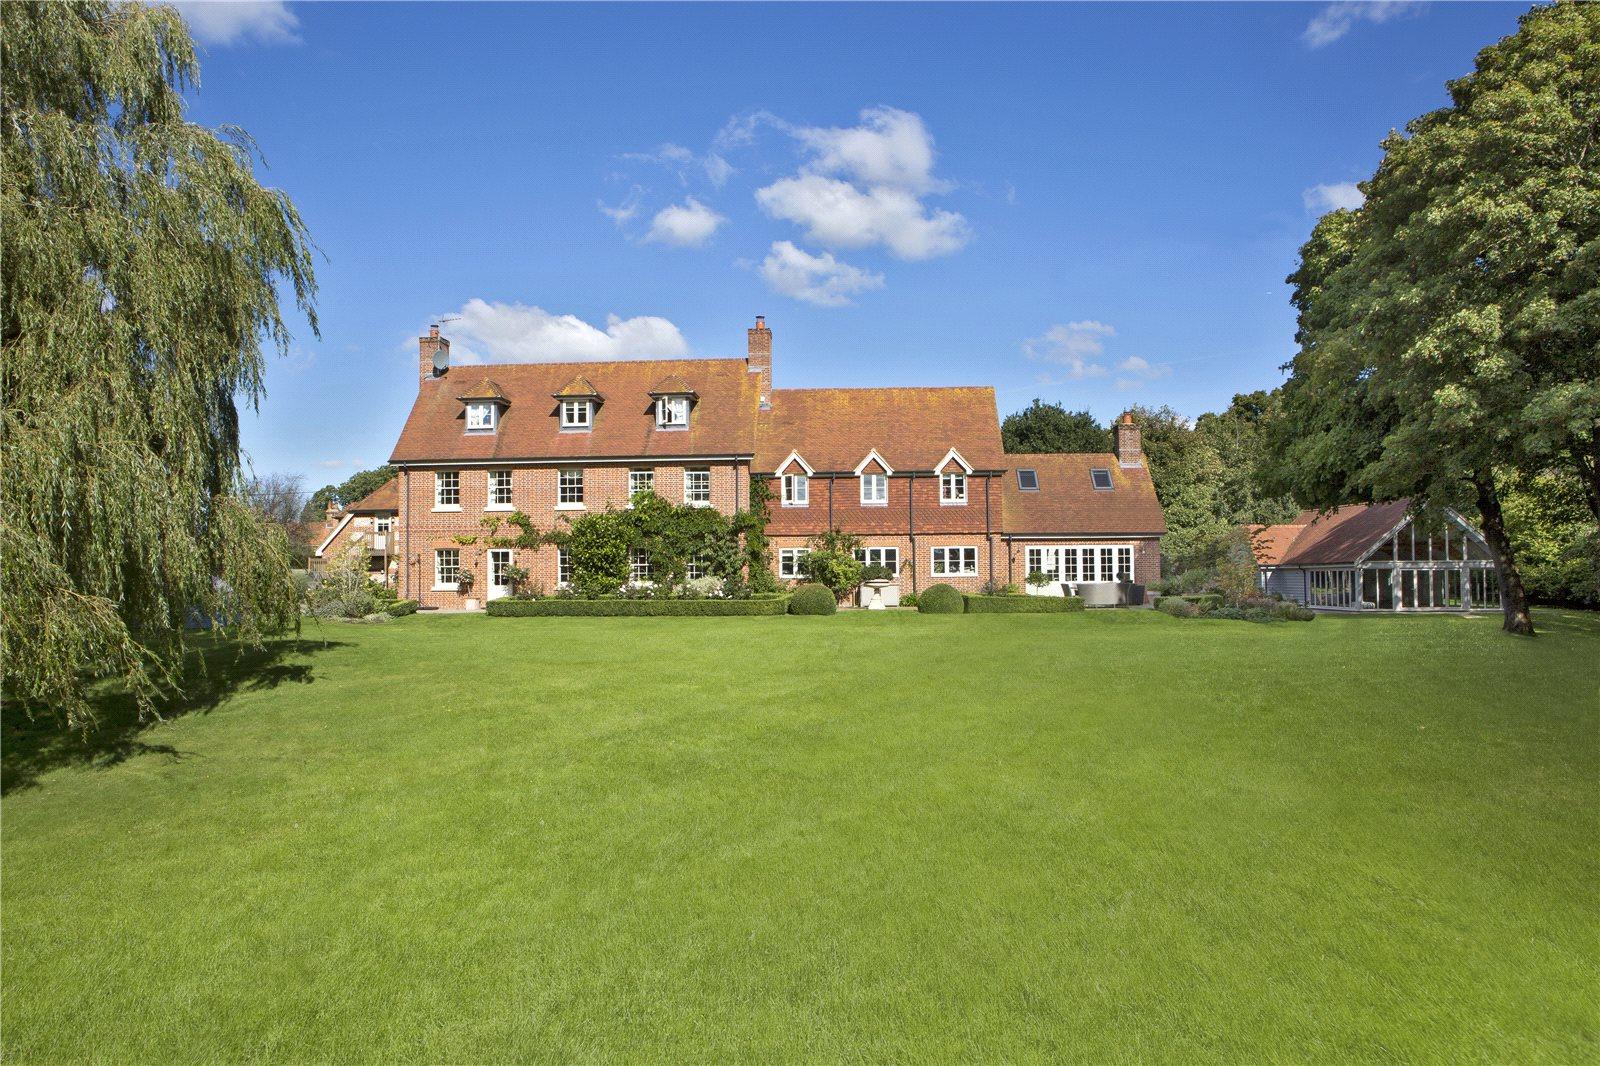 Single Family Home for Sale at Hamstead Marshall, Newbury, Berkshire, RG20 Newbury, England